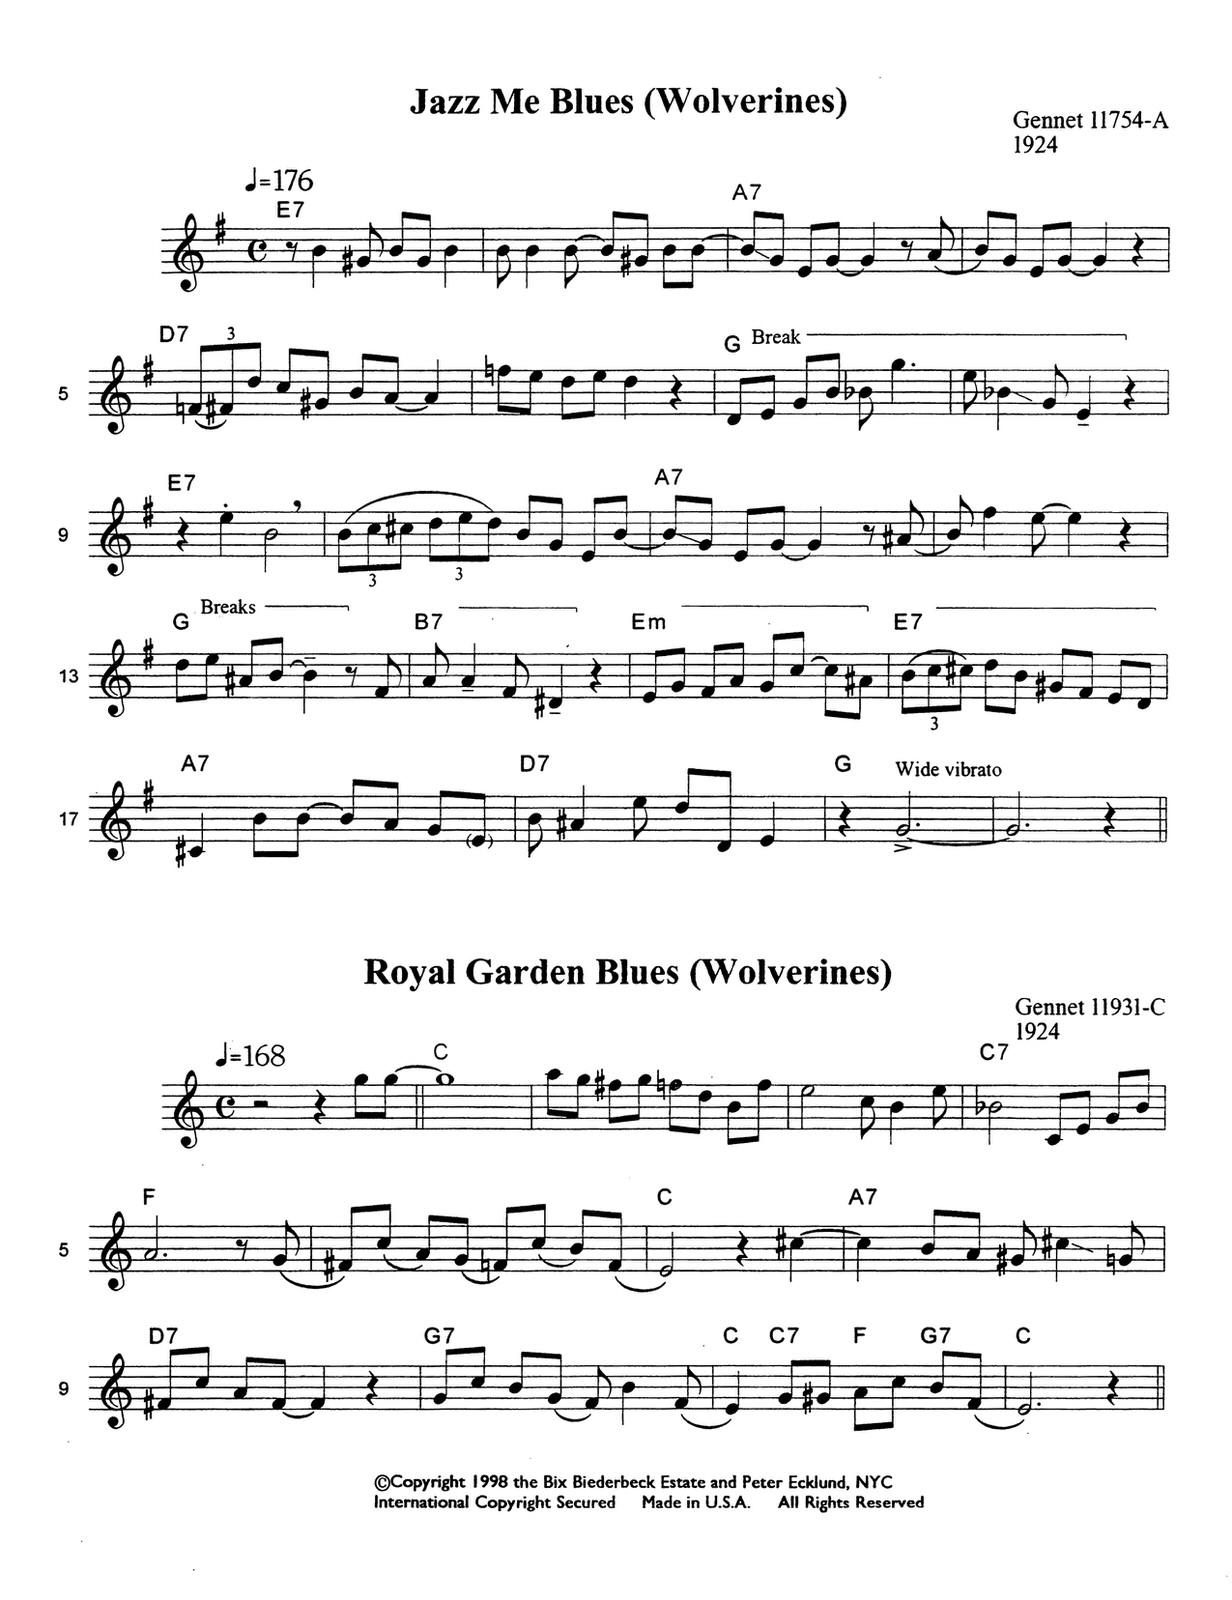 Beiderbecke, Bix, Great Cornet Solos of Bix 3